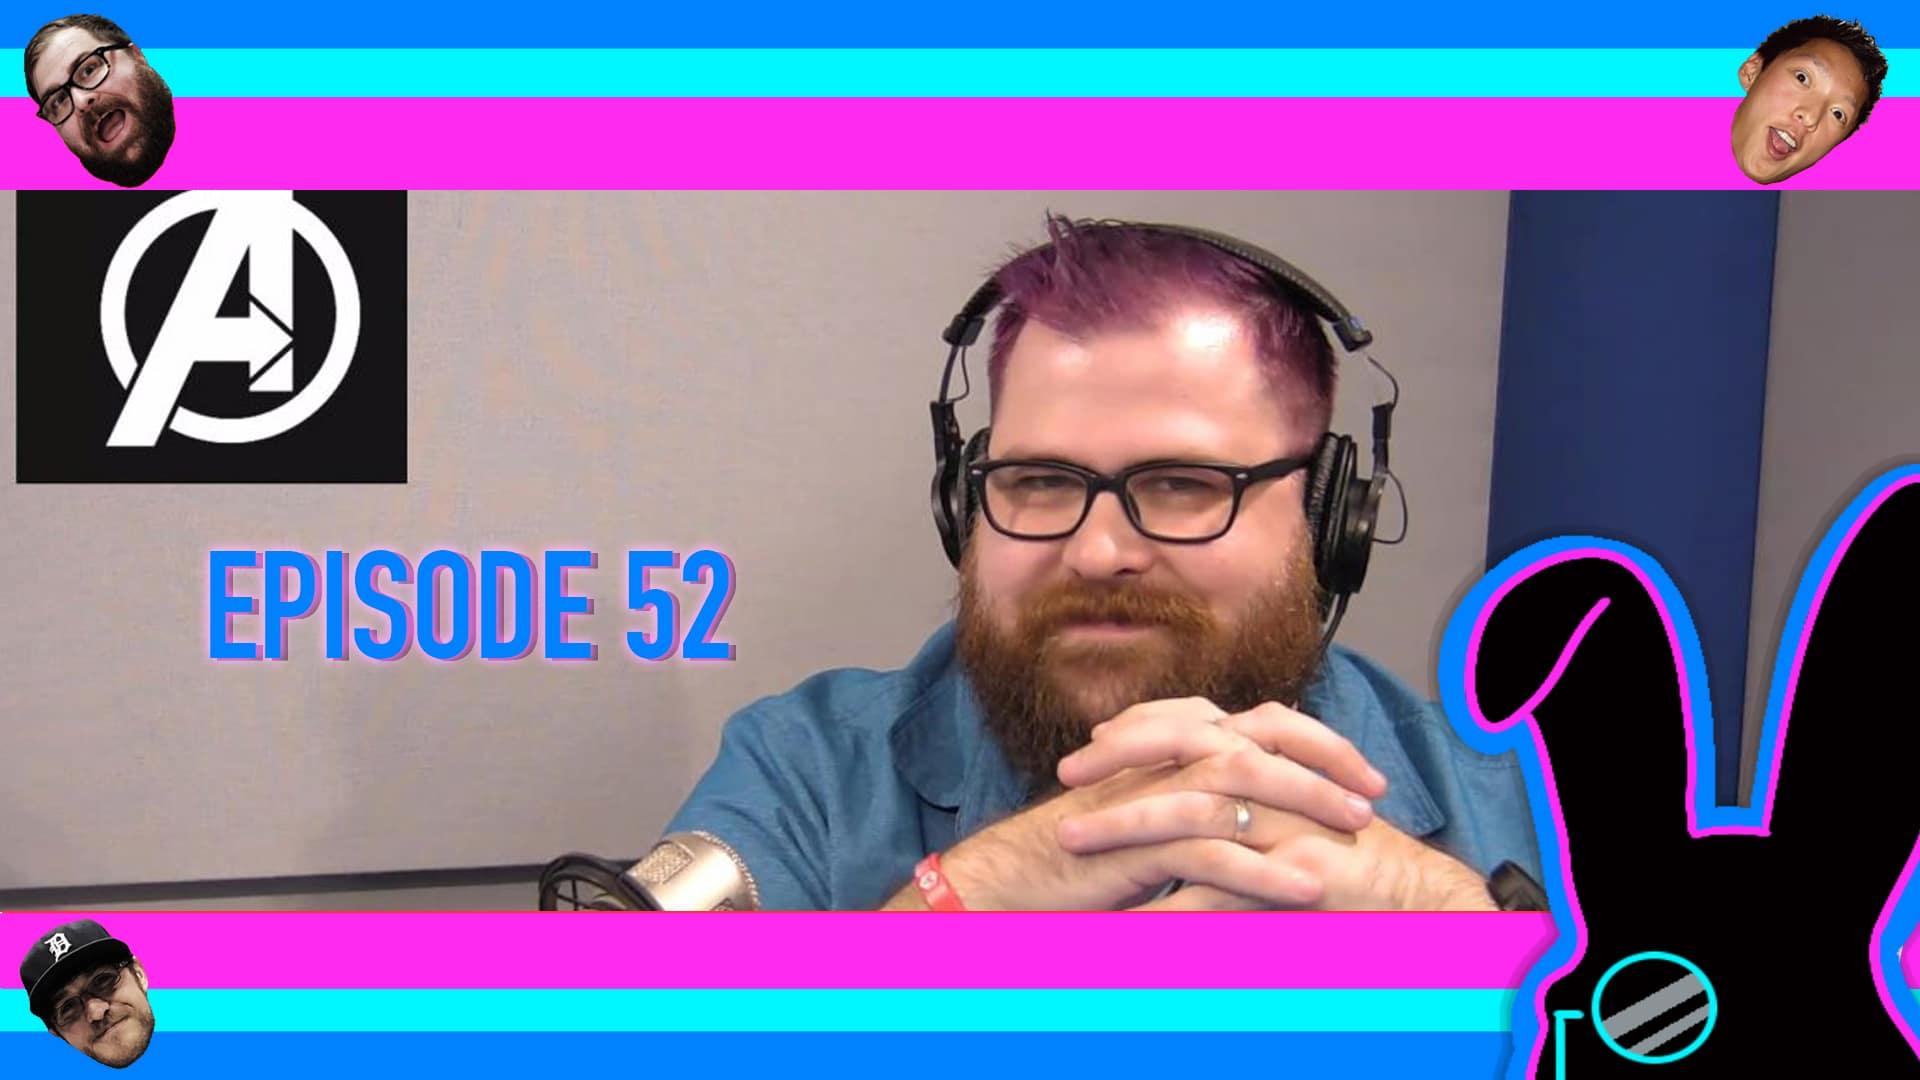 Geektainment Weekly - Episode 52